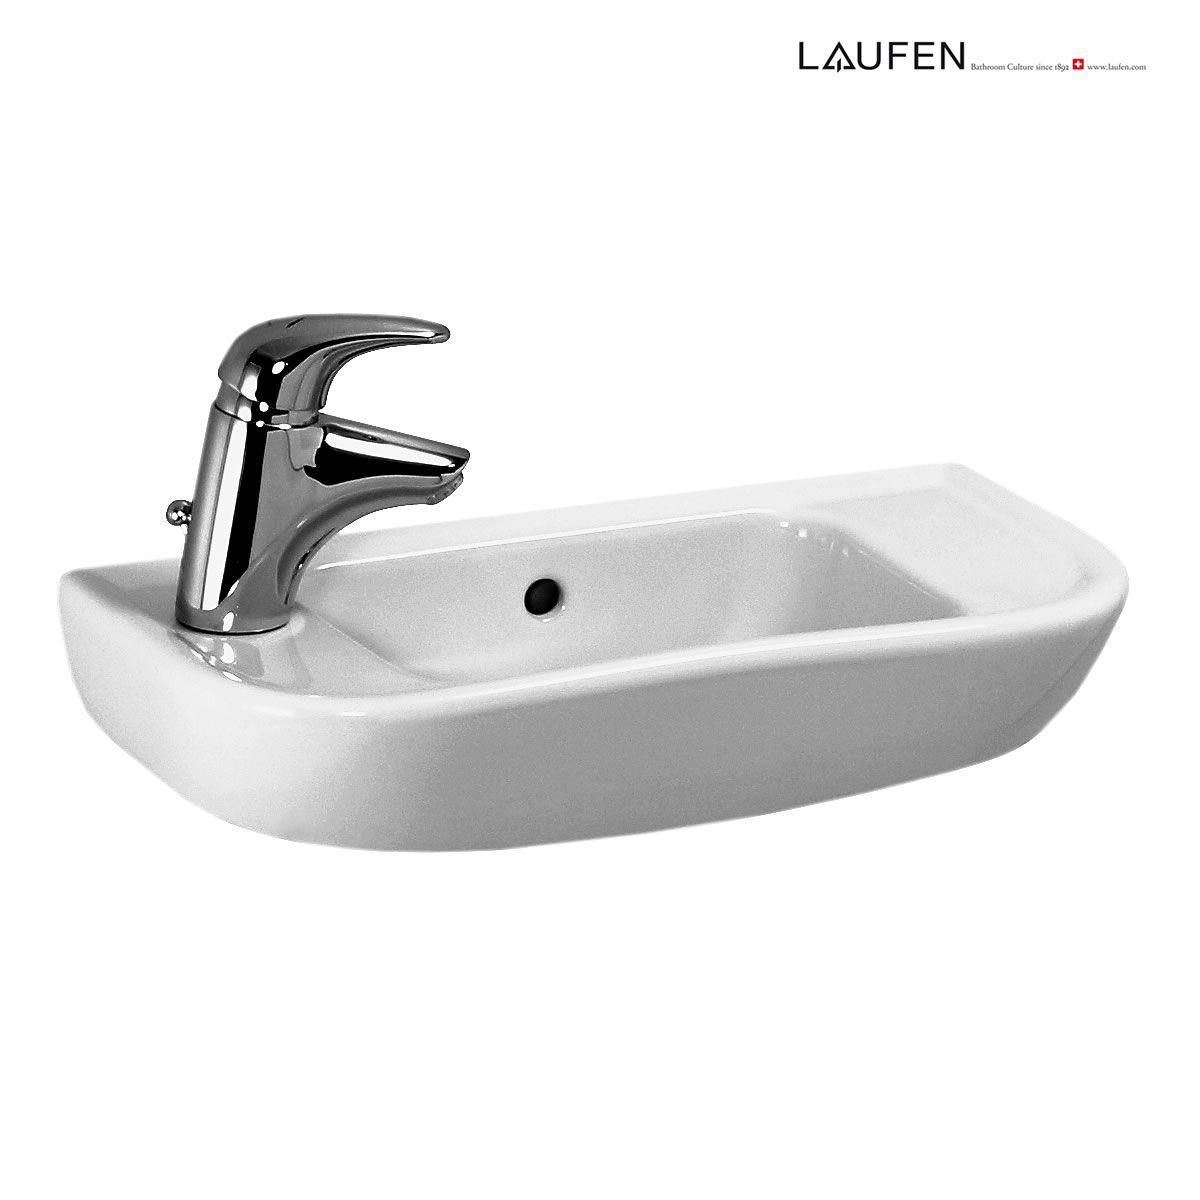 laufen pro c hand basin 500 x 250mm uk bathrooms. Black Bedroom Furniture Sets. Home Design Ideas